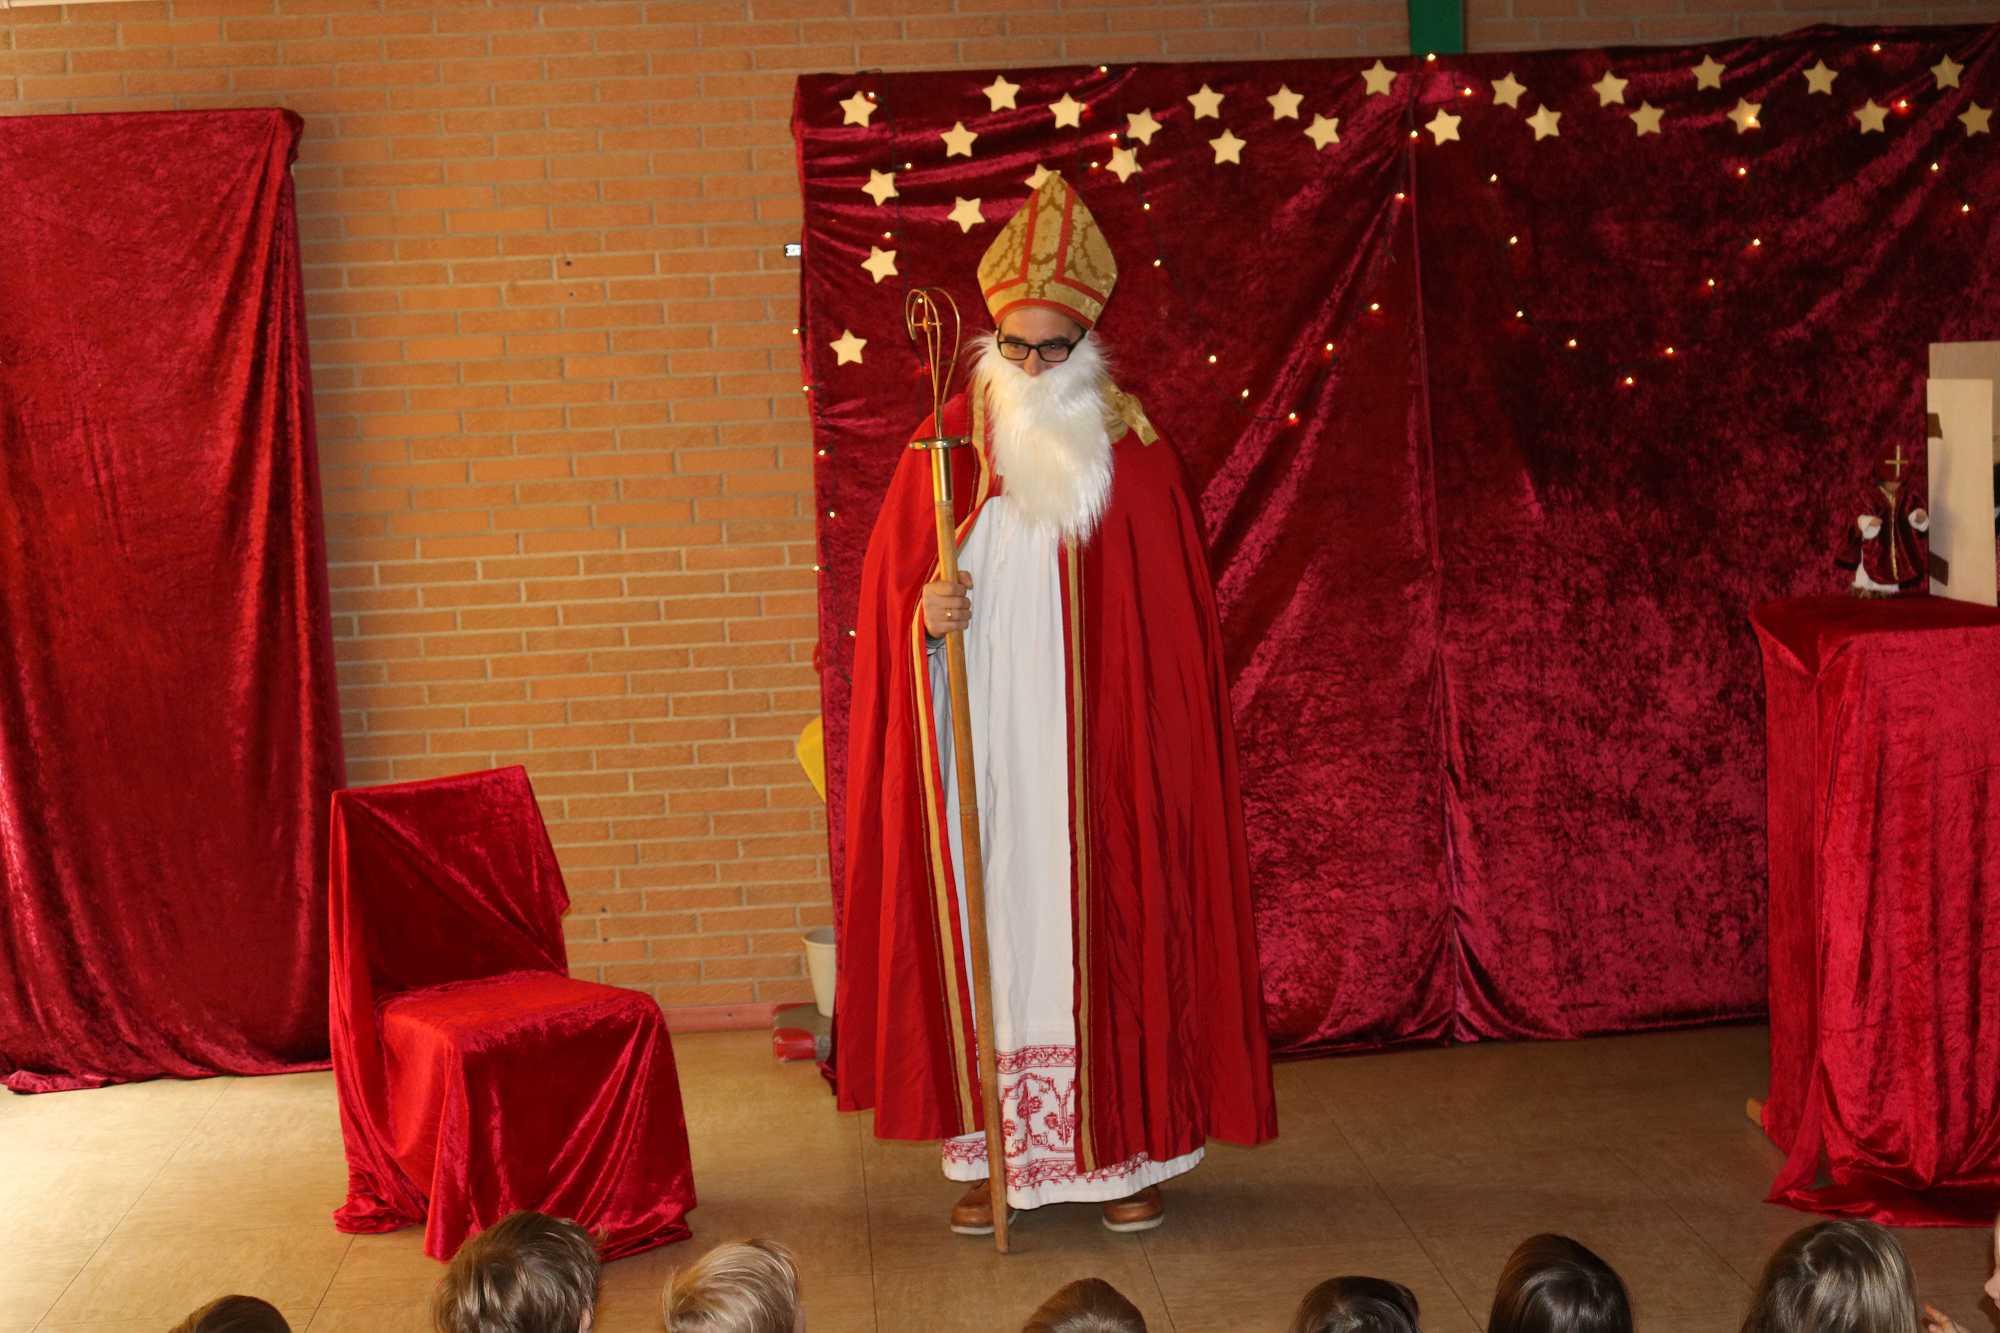 Nikolausfeier in der KiTa St. Marien Kita Griesheim